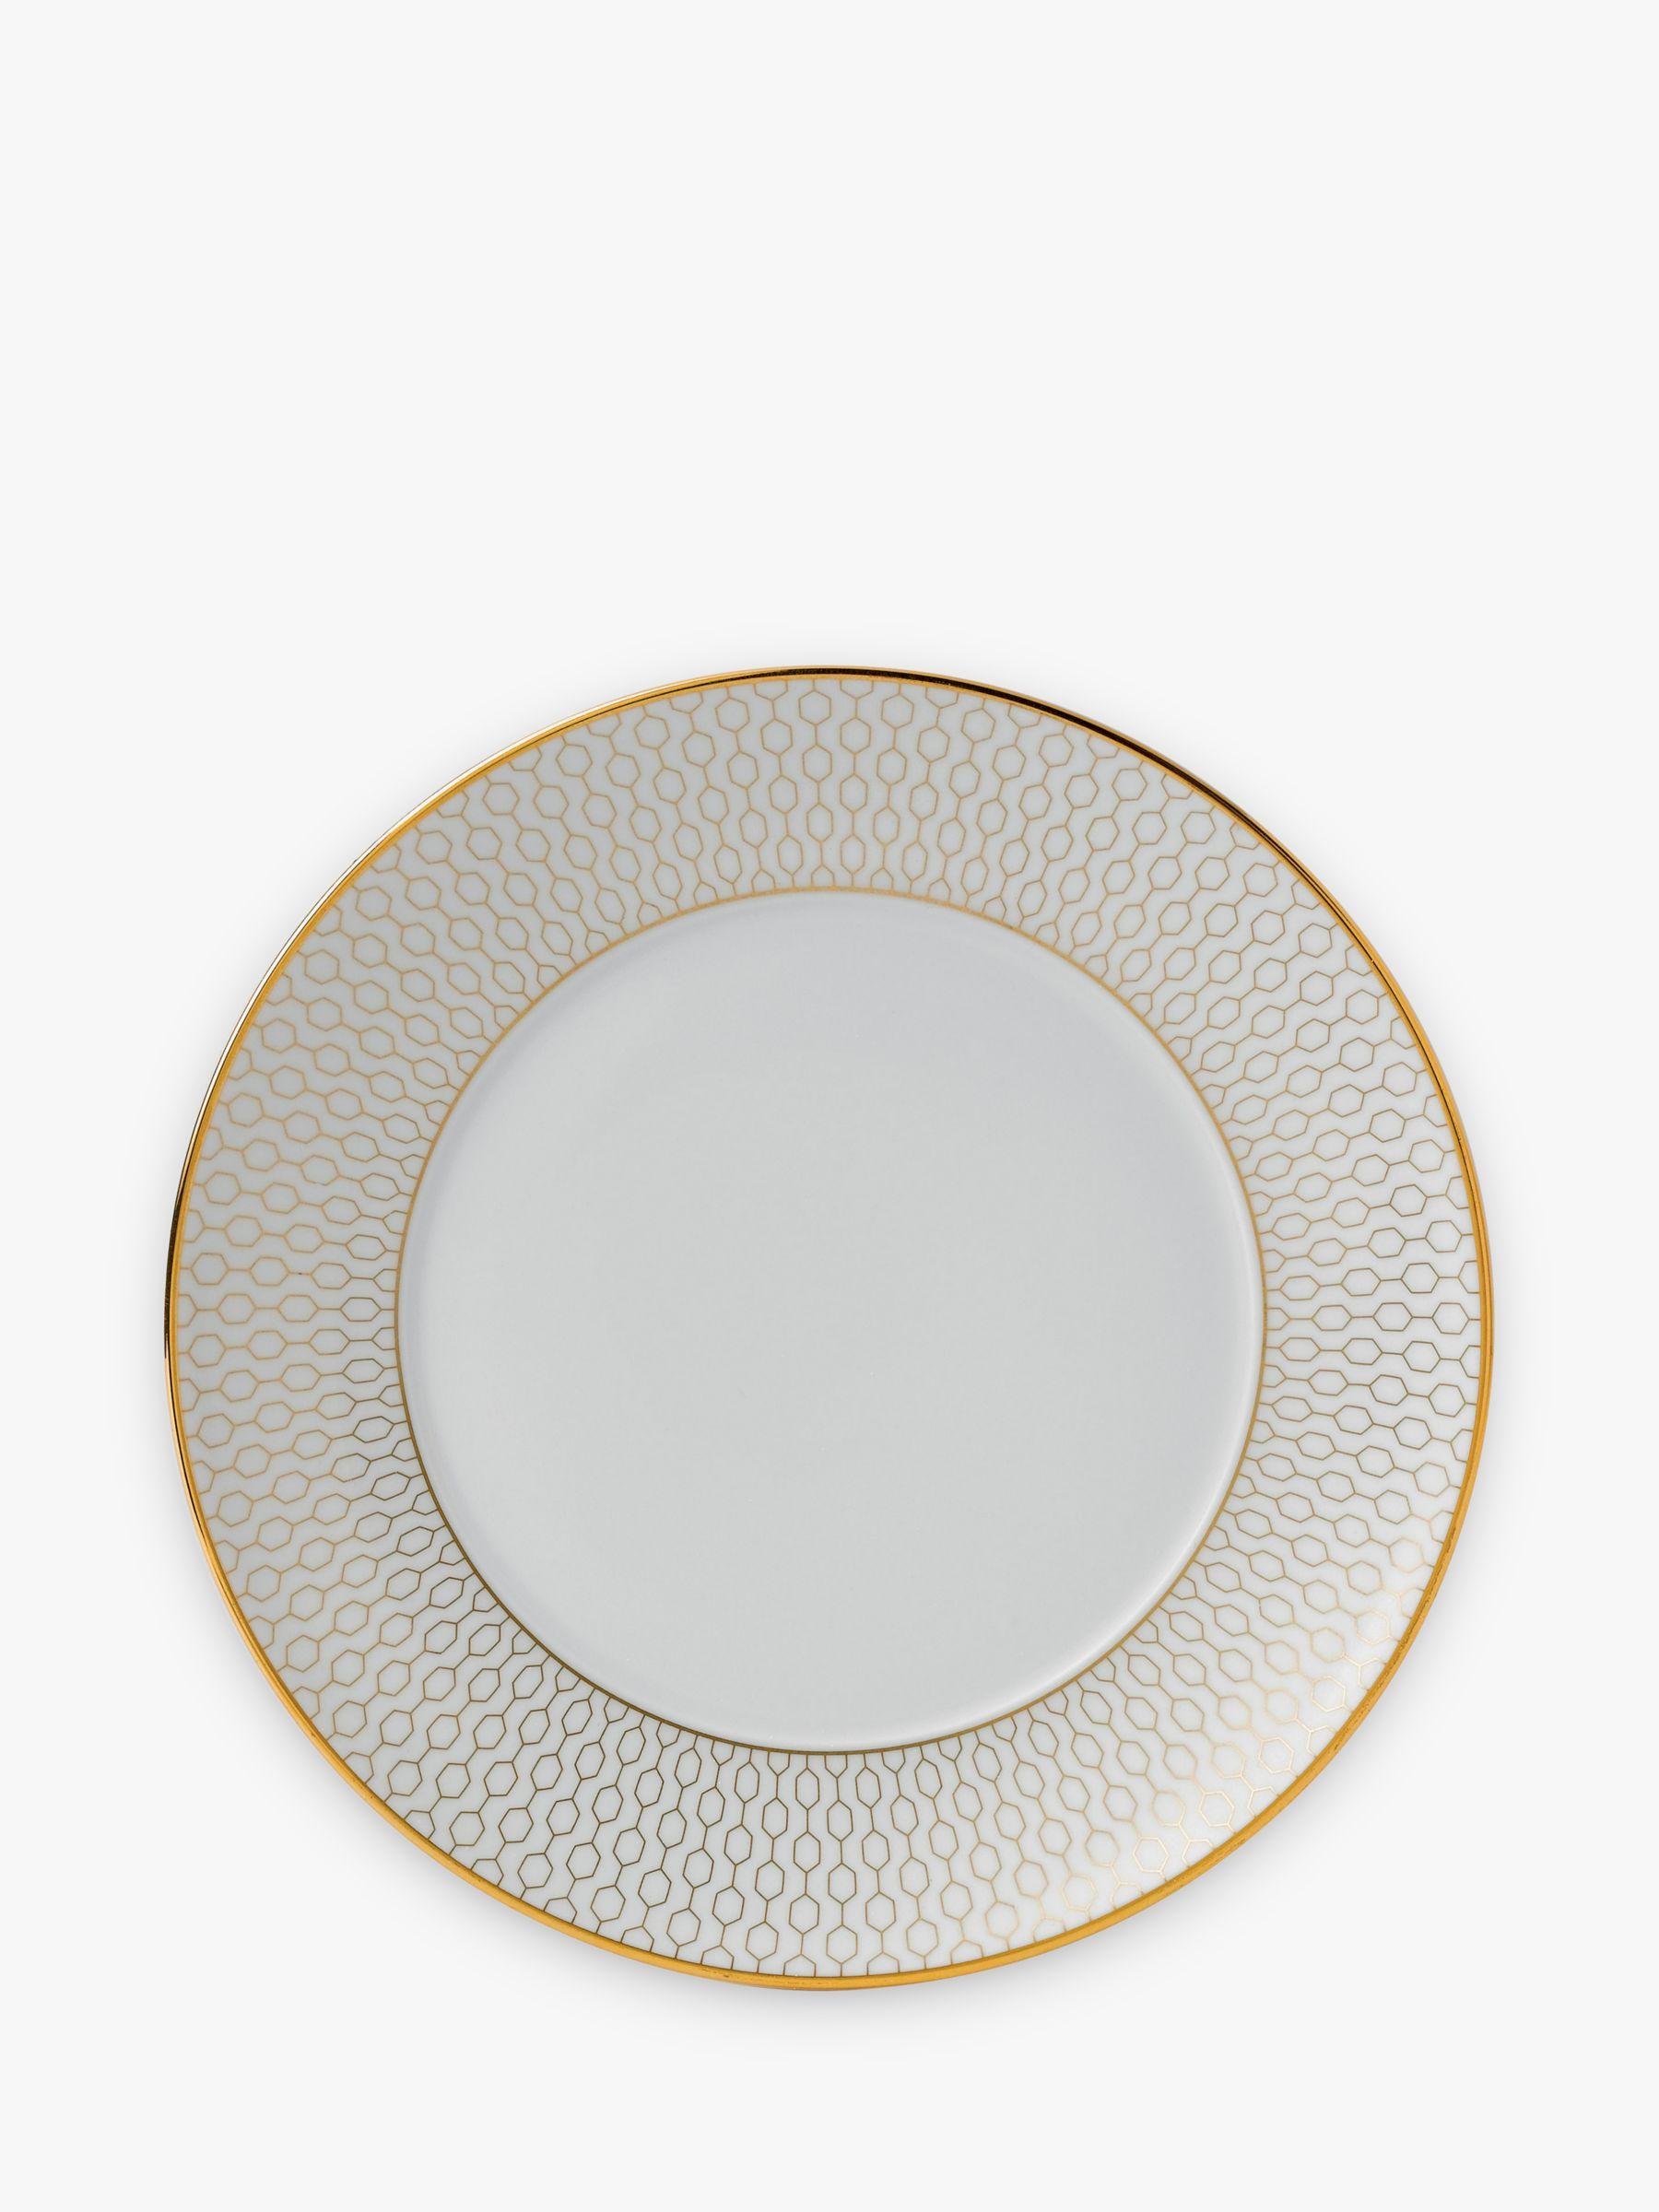 Wedgwood Wedgwood Arris Side Plate, 17cm, Gold/White